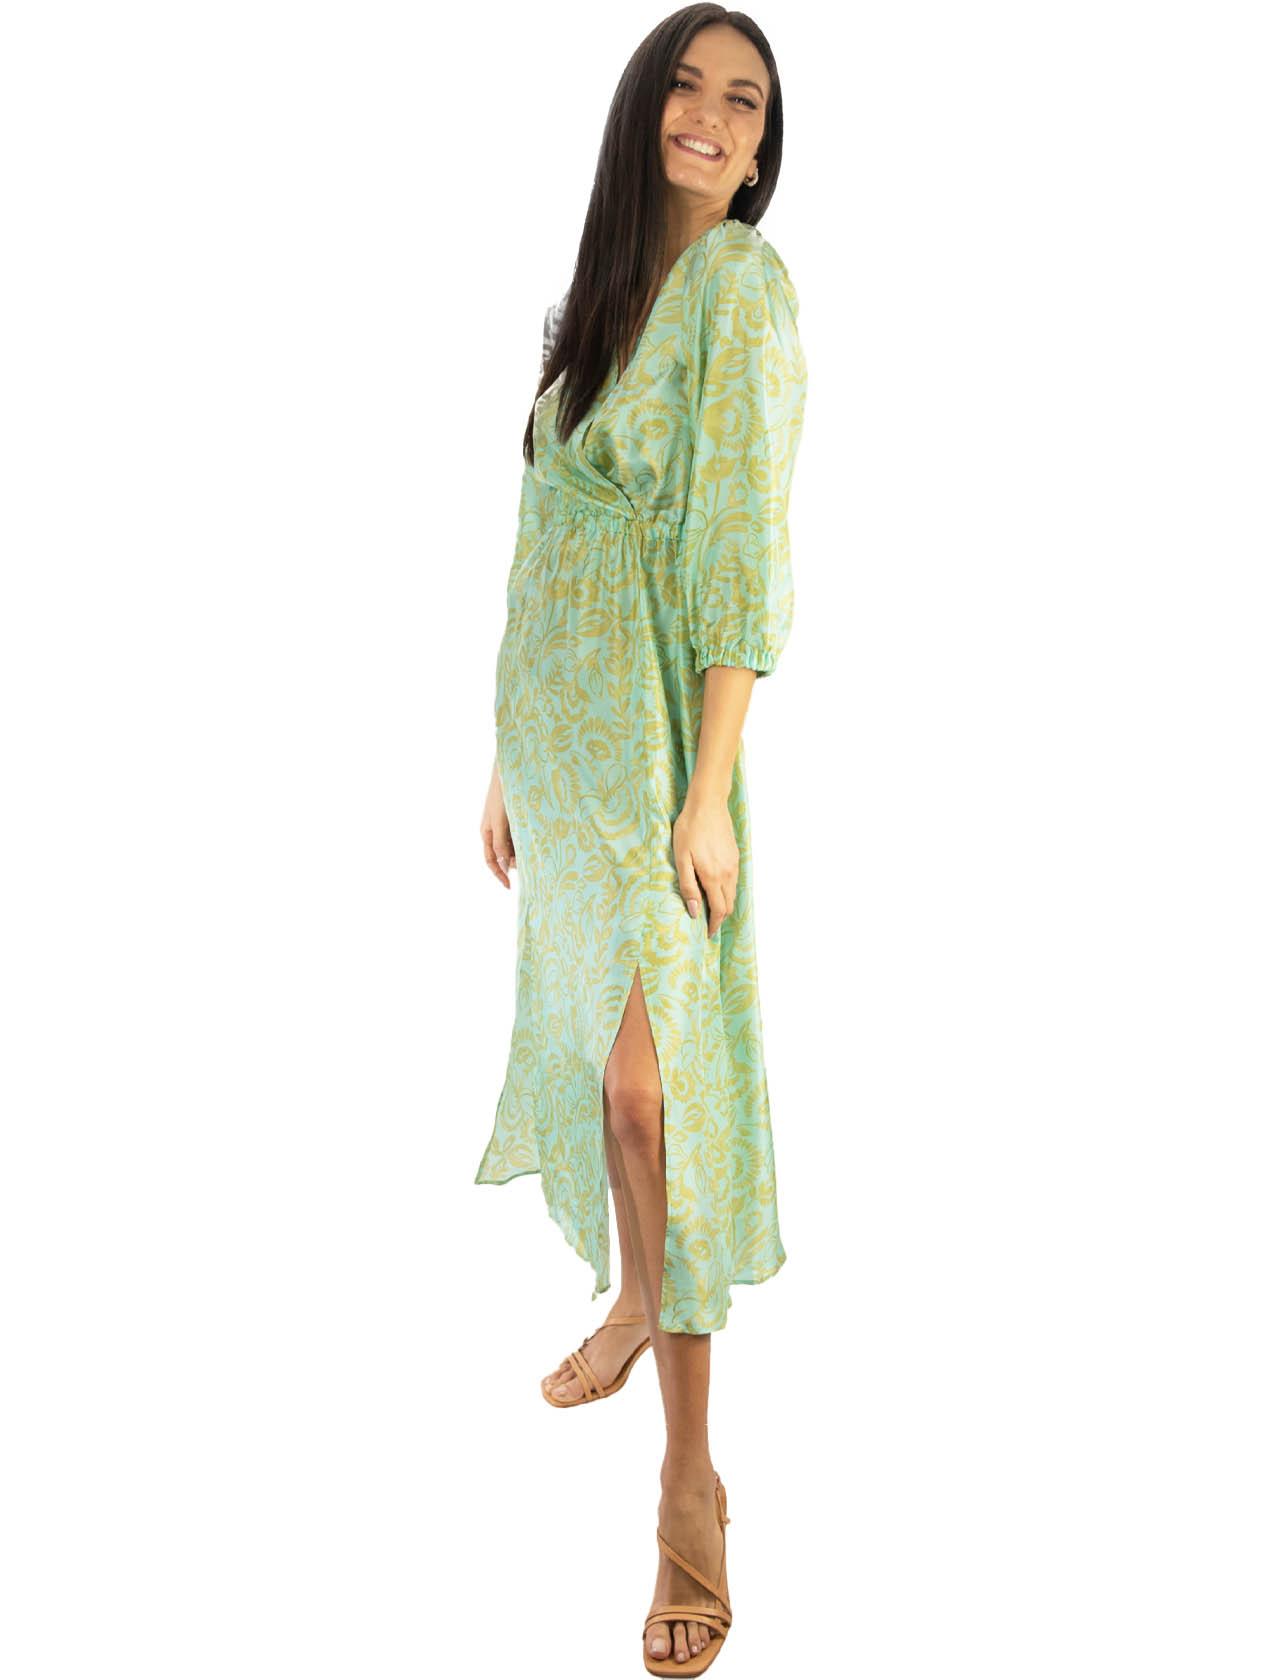 Women's Clothing Long Dress in Turkish Delight Silk Aqua and Gold Maliparmi |  | JF645830111C6018